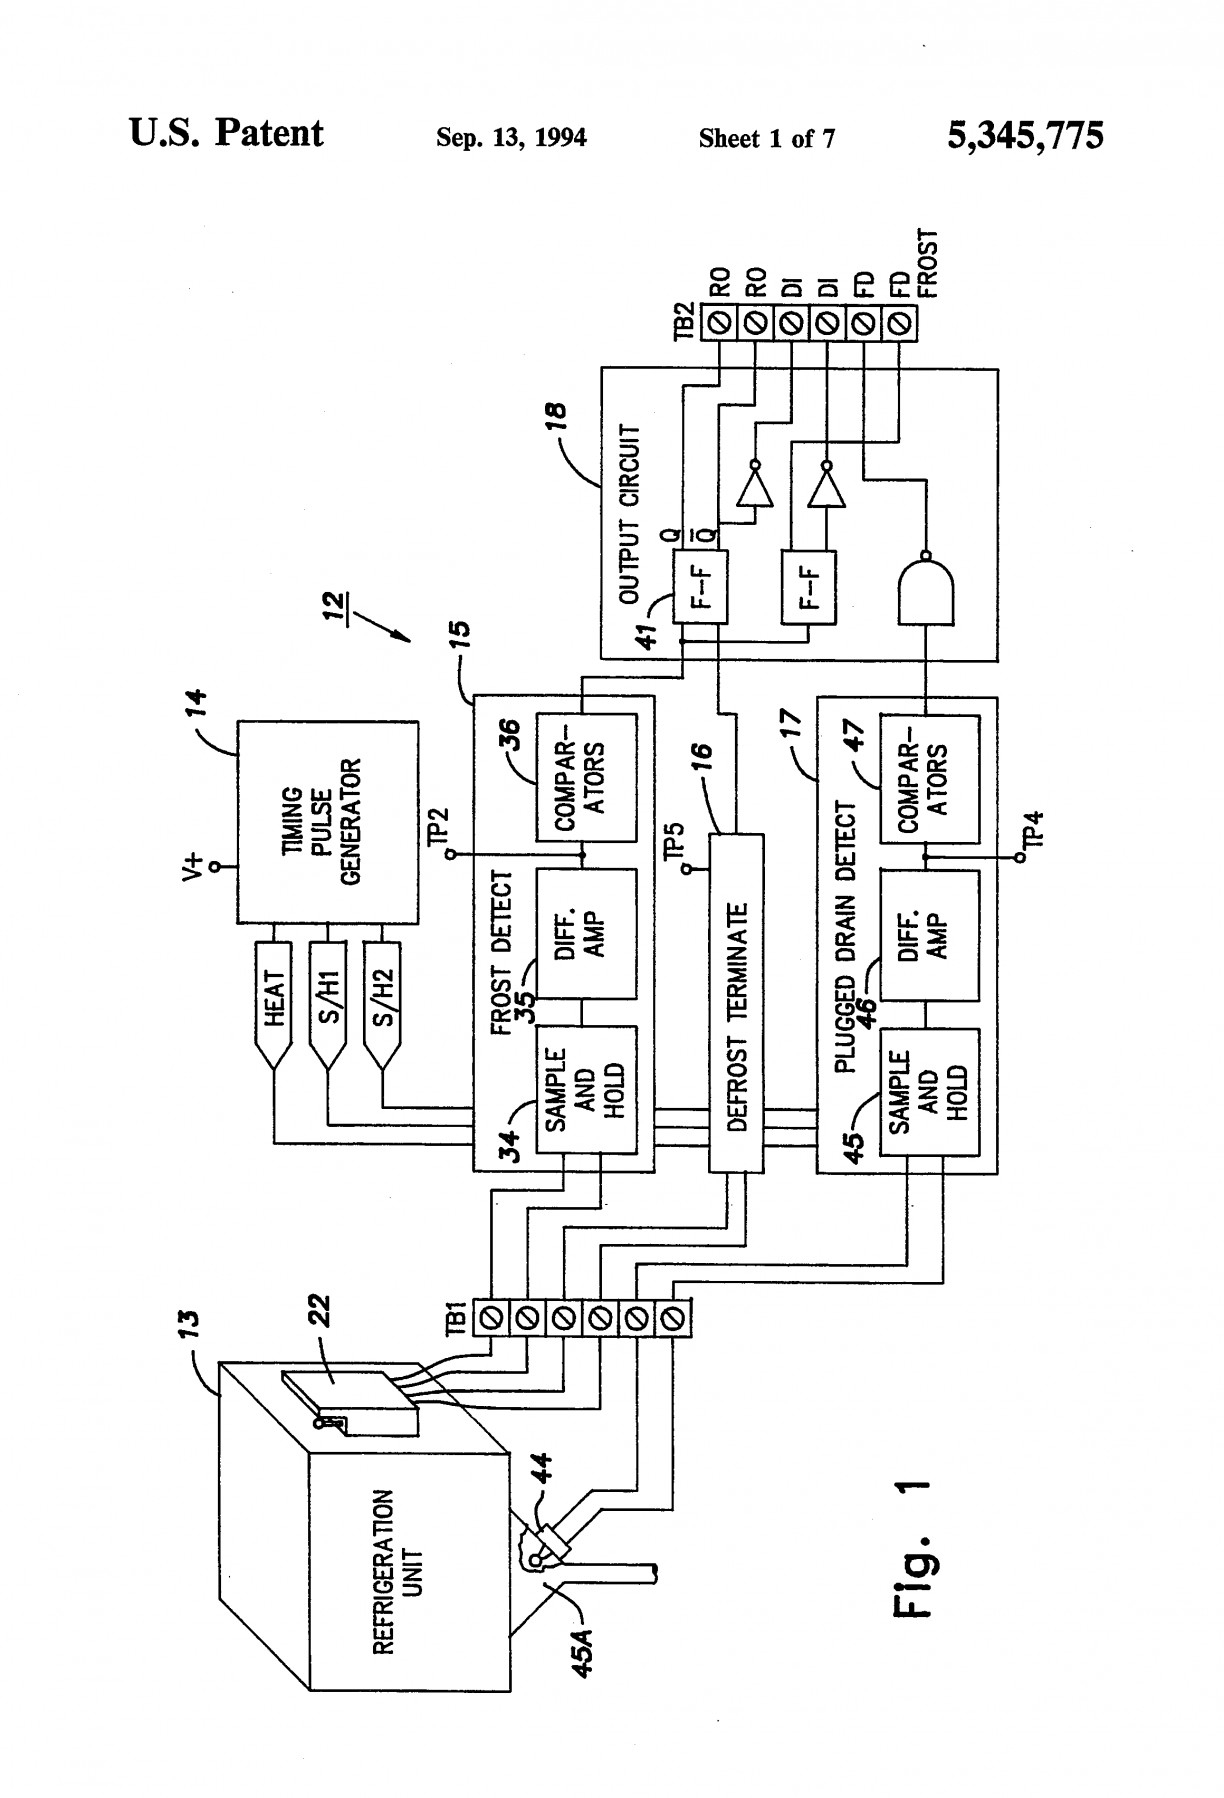 Russell Evaporator Wiring Diagram